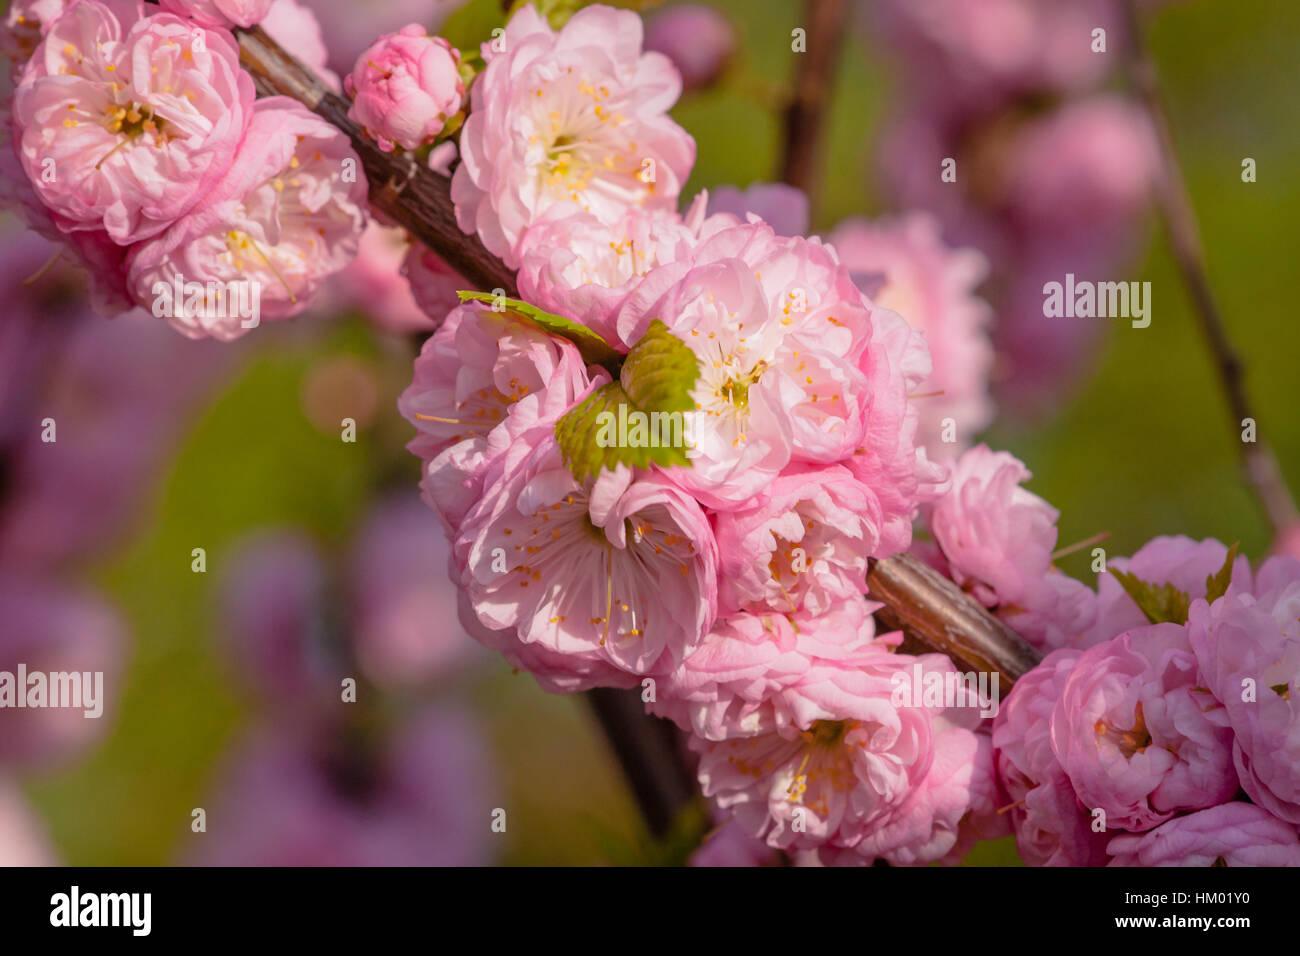 Flowering Almond Prunus Triloba Stock Photos Flowering Almond